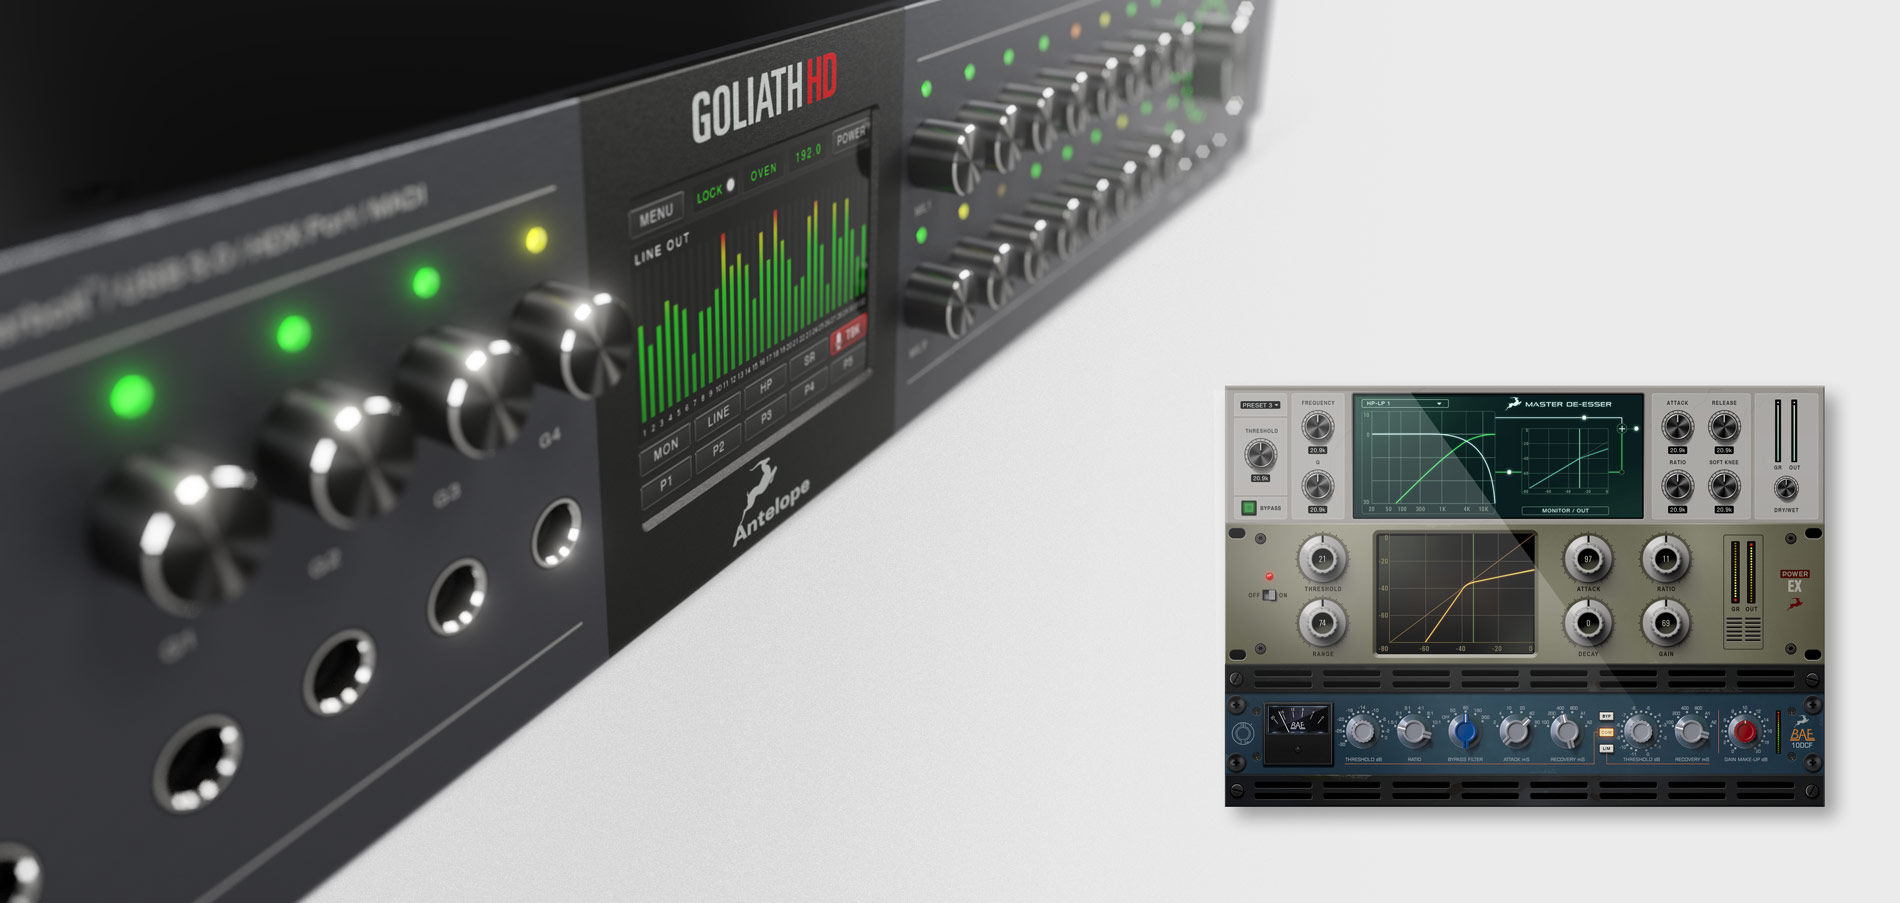 New Goliath HD update – featuring three new FPGA FX